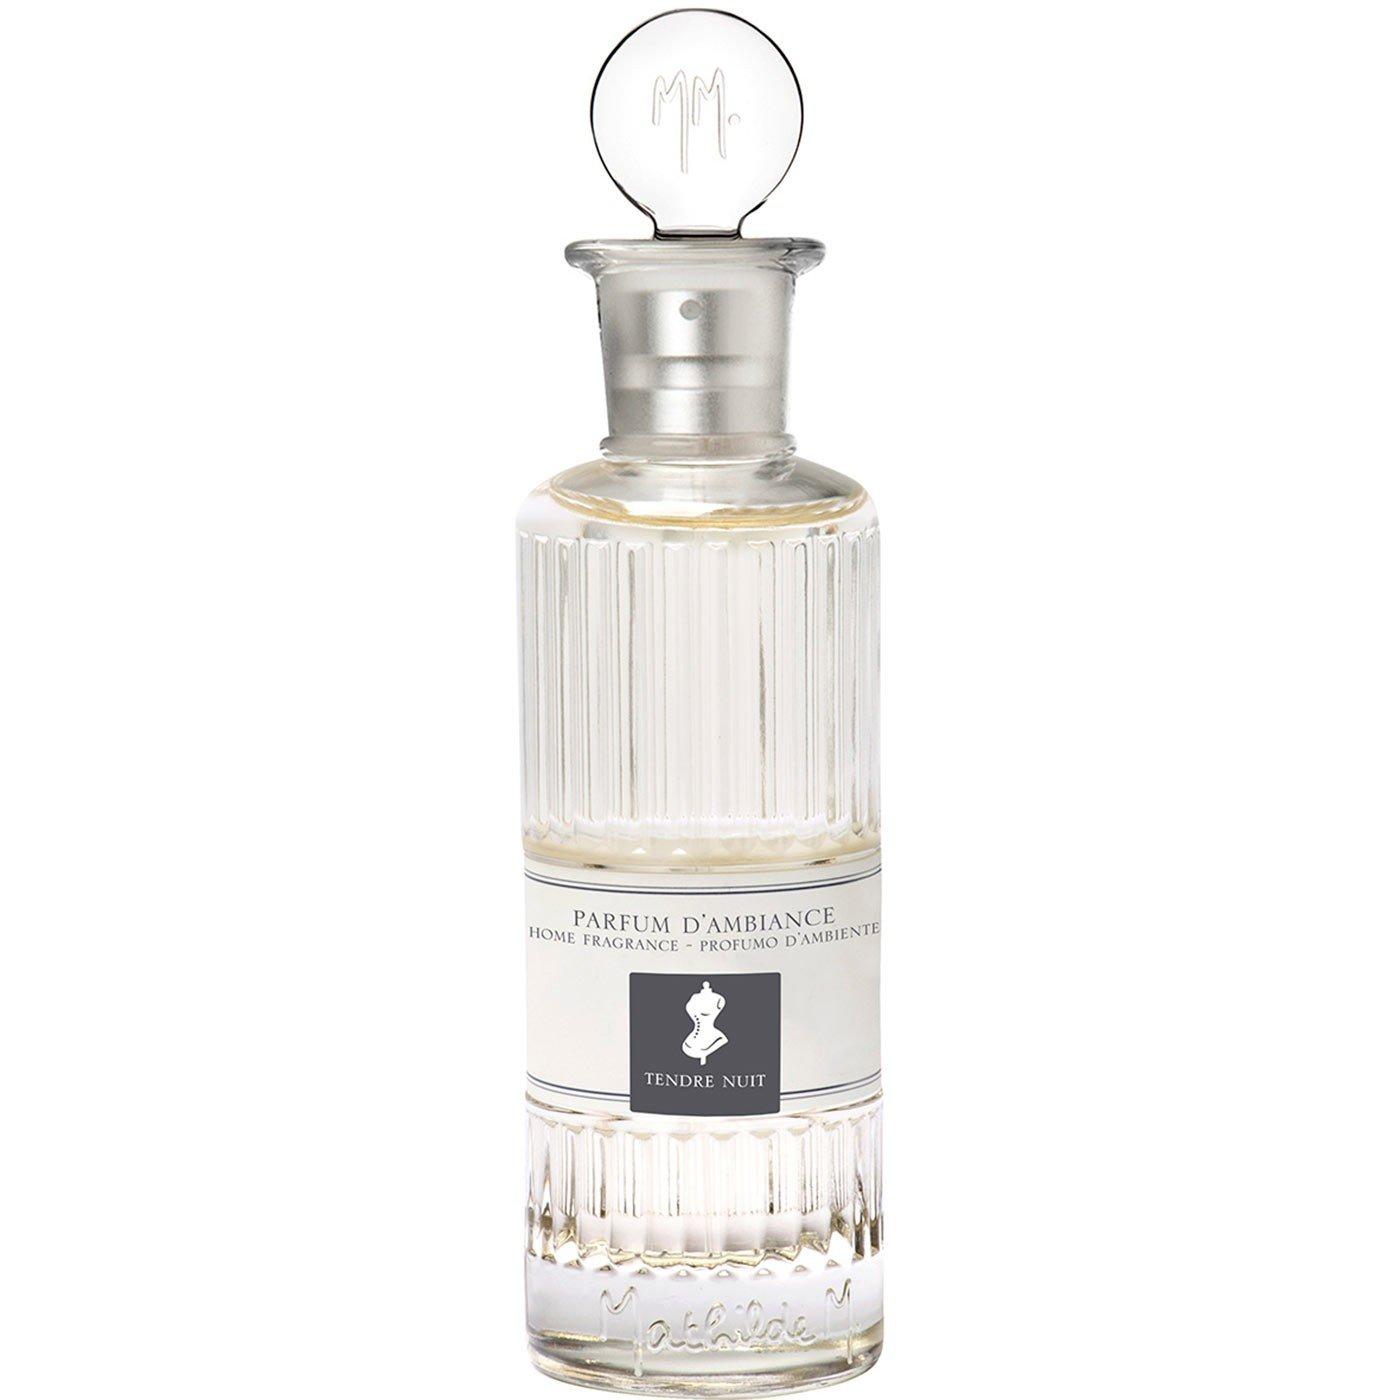 stratto Vaporizzatore di profumo per ambiente 100 ml Marquise-Spray Vapo d'Intérieur Mathilde M MATHILDE M.